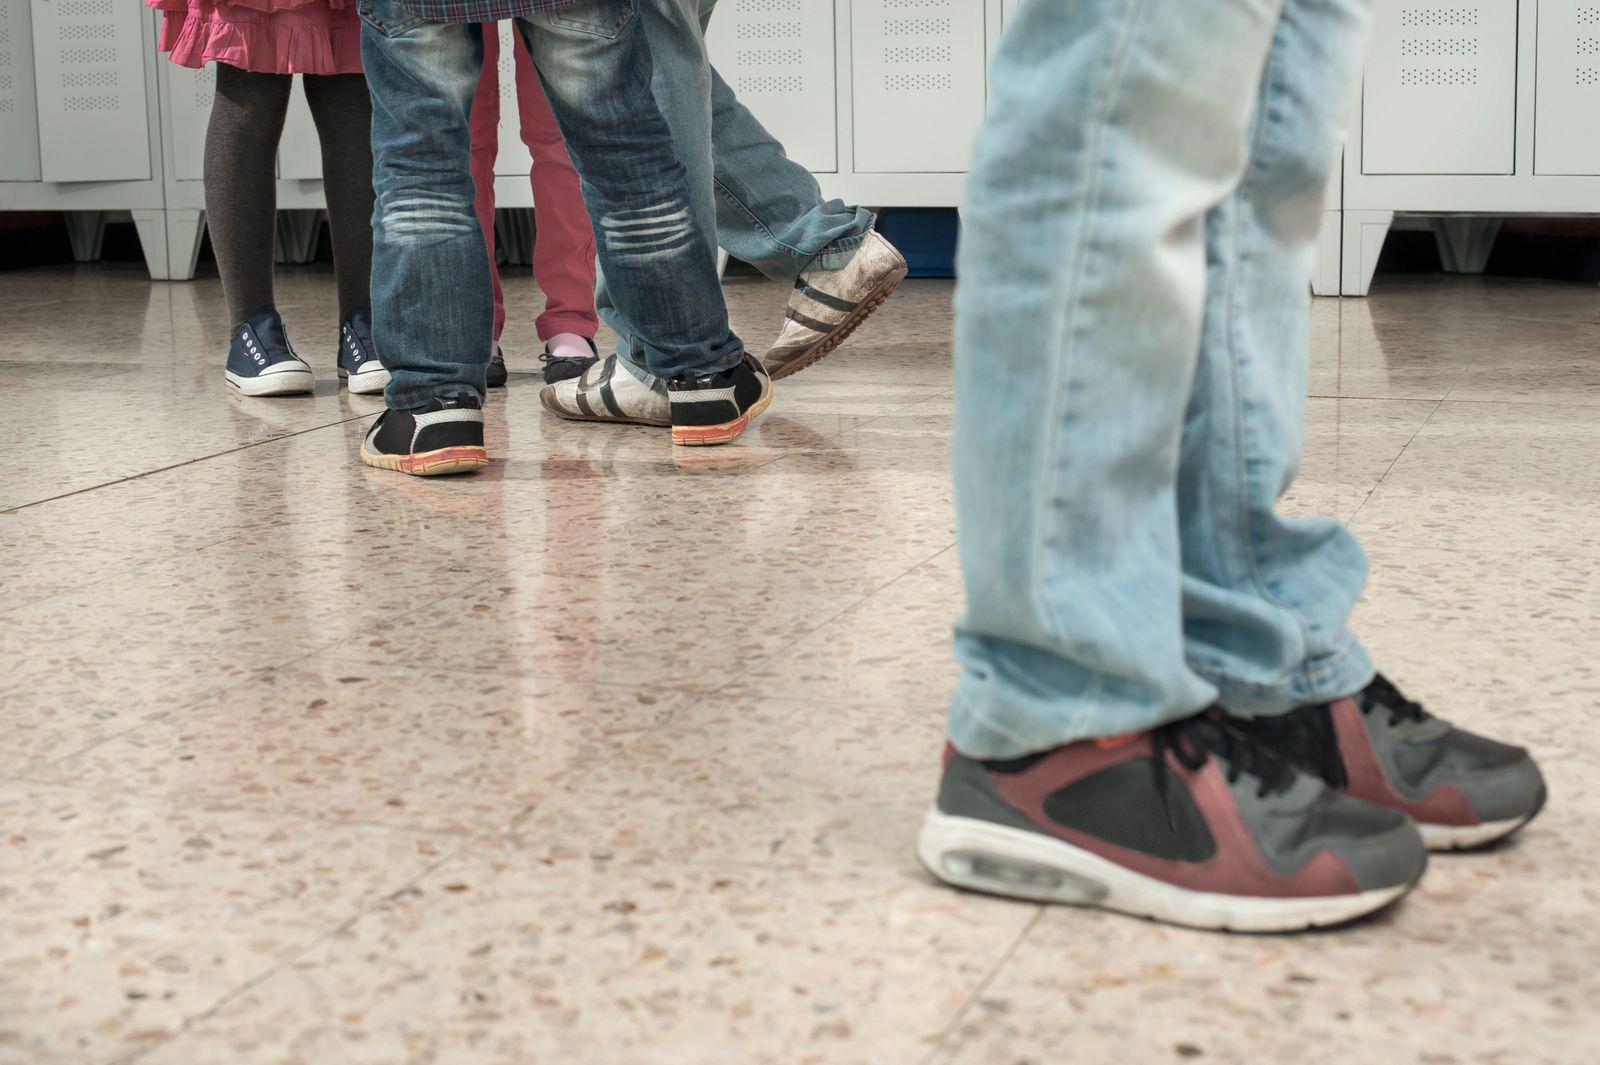 Schoolboy being bullied by his classmates in school, Bavaria, Germany